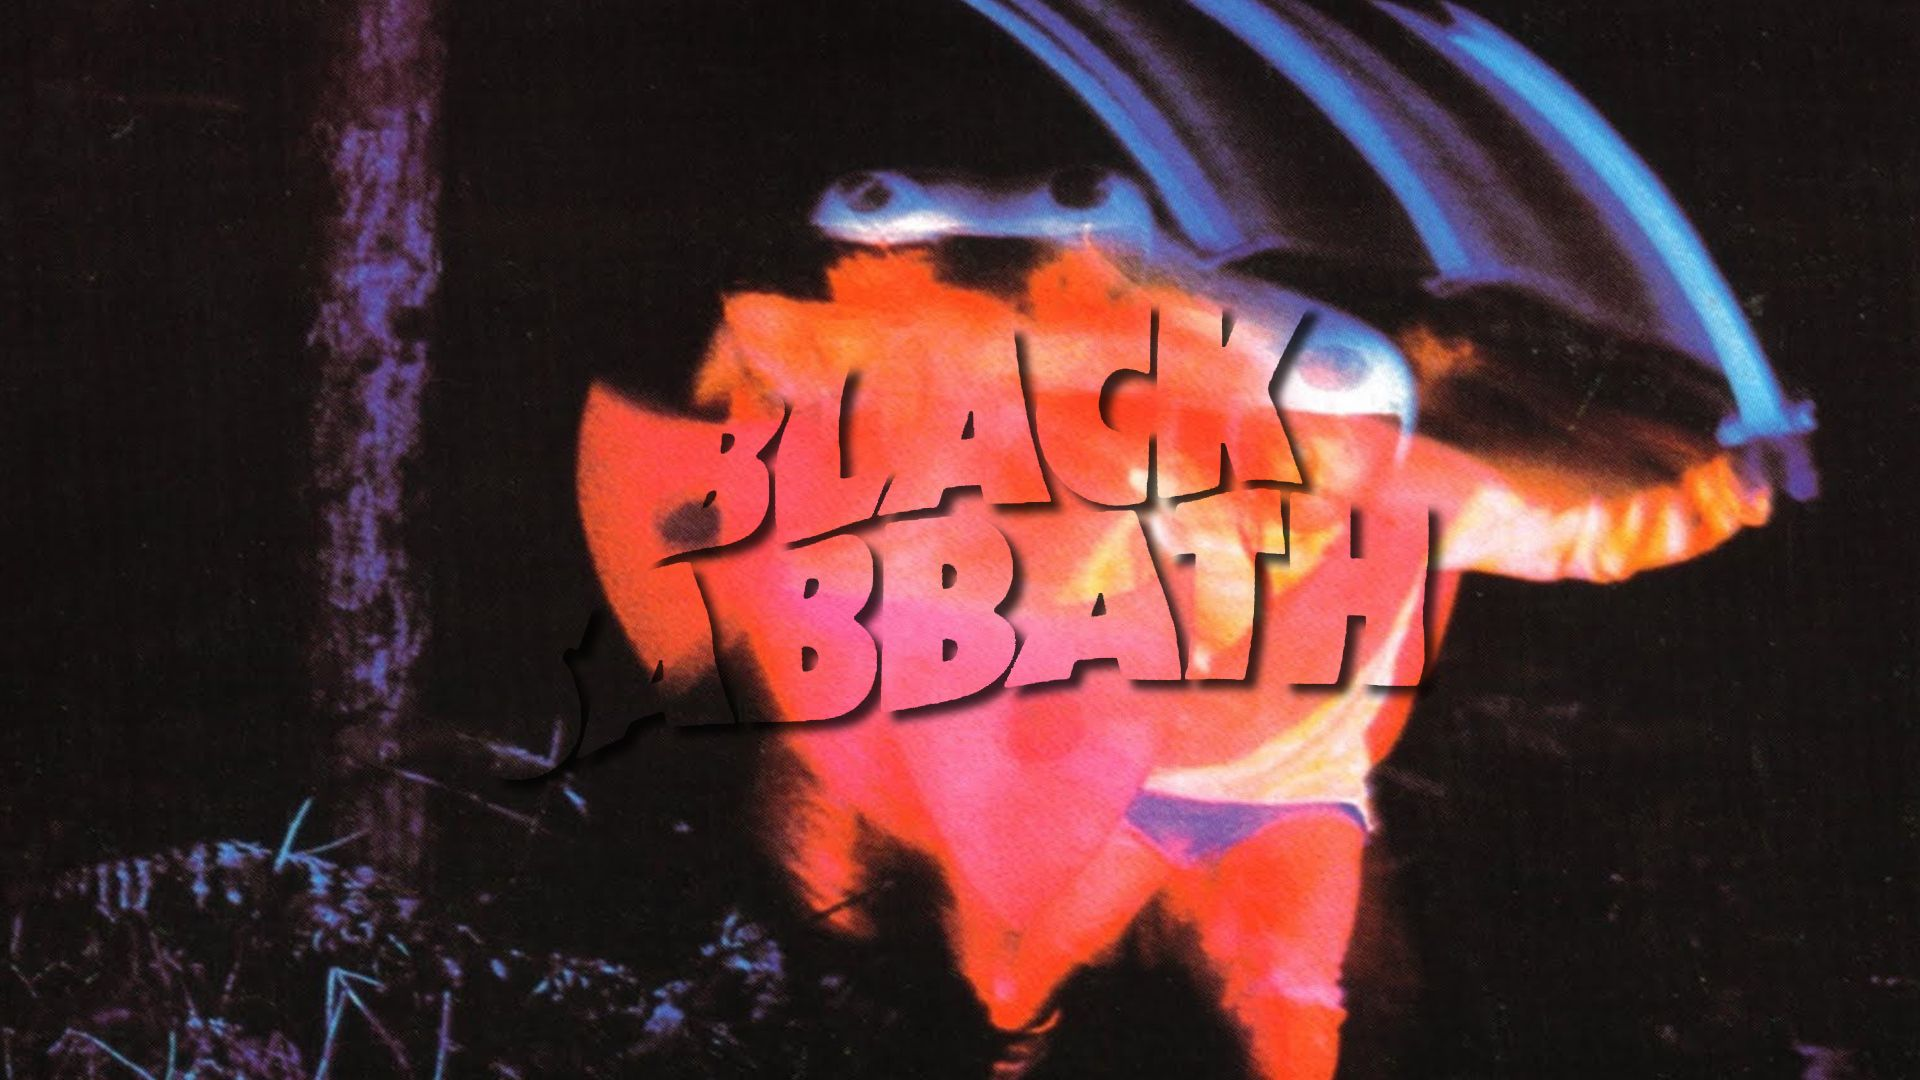 Black Sabbath Wallpaper 1920 X 1080 R Wallpapers Wallpaper 1920 Black Sabbath Wallpaper Wallpaper 1920 X 1080